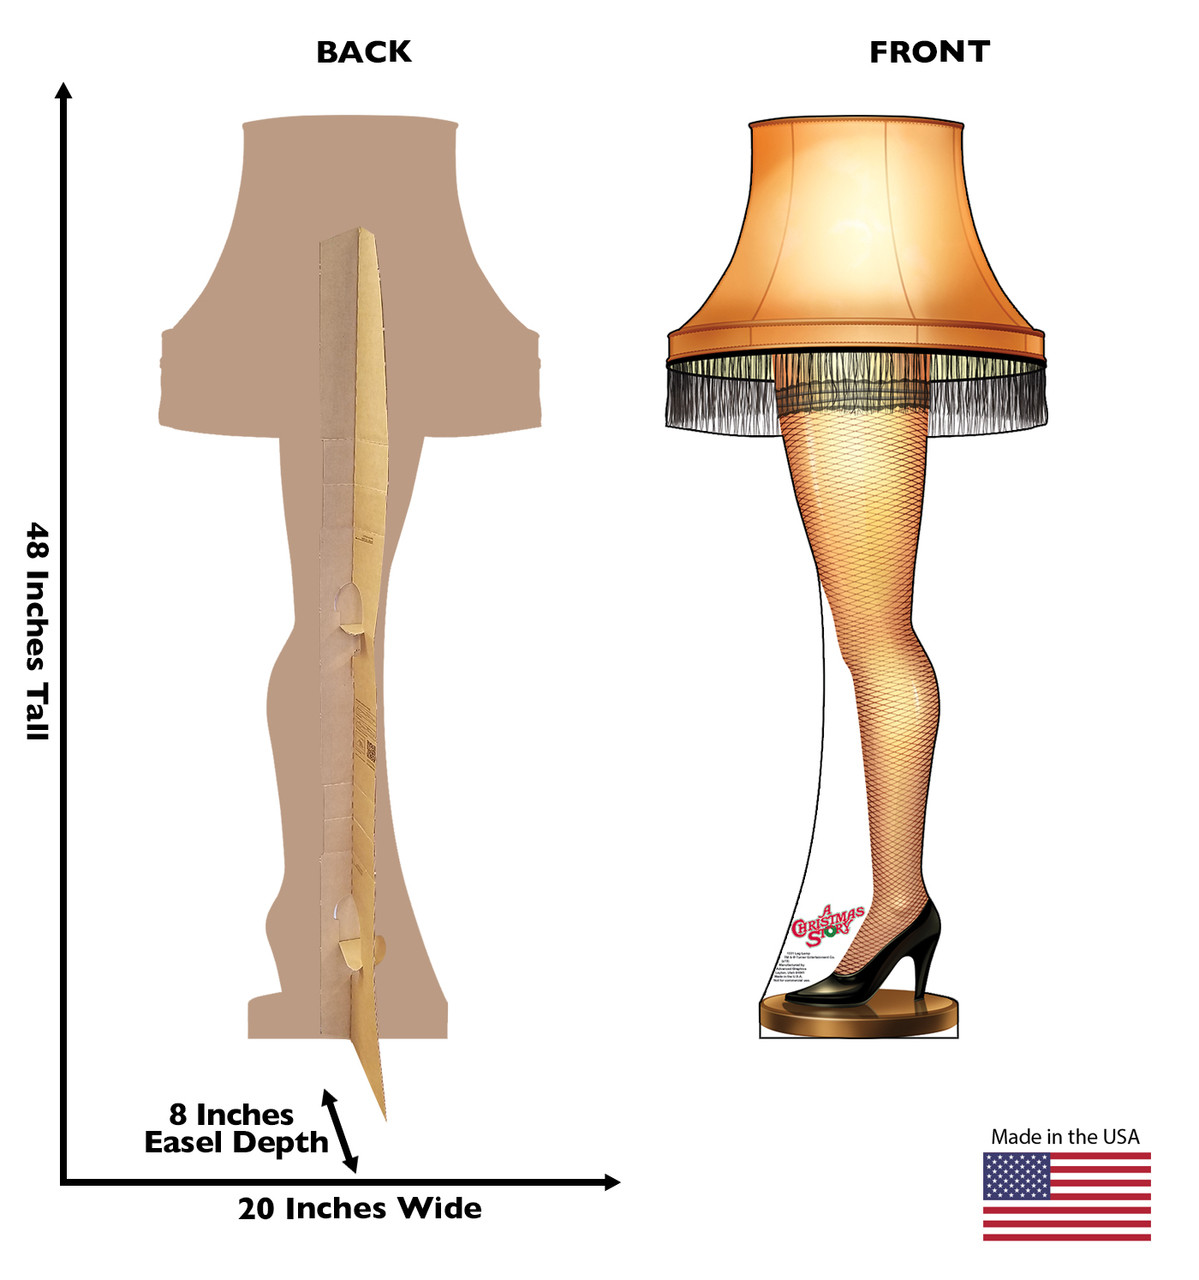 Life Size Leg Lamp